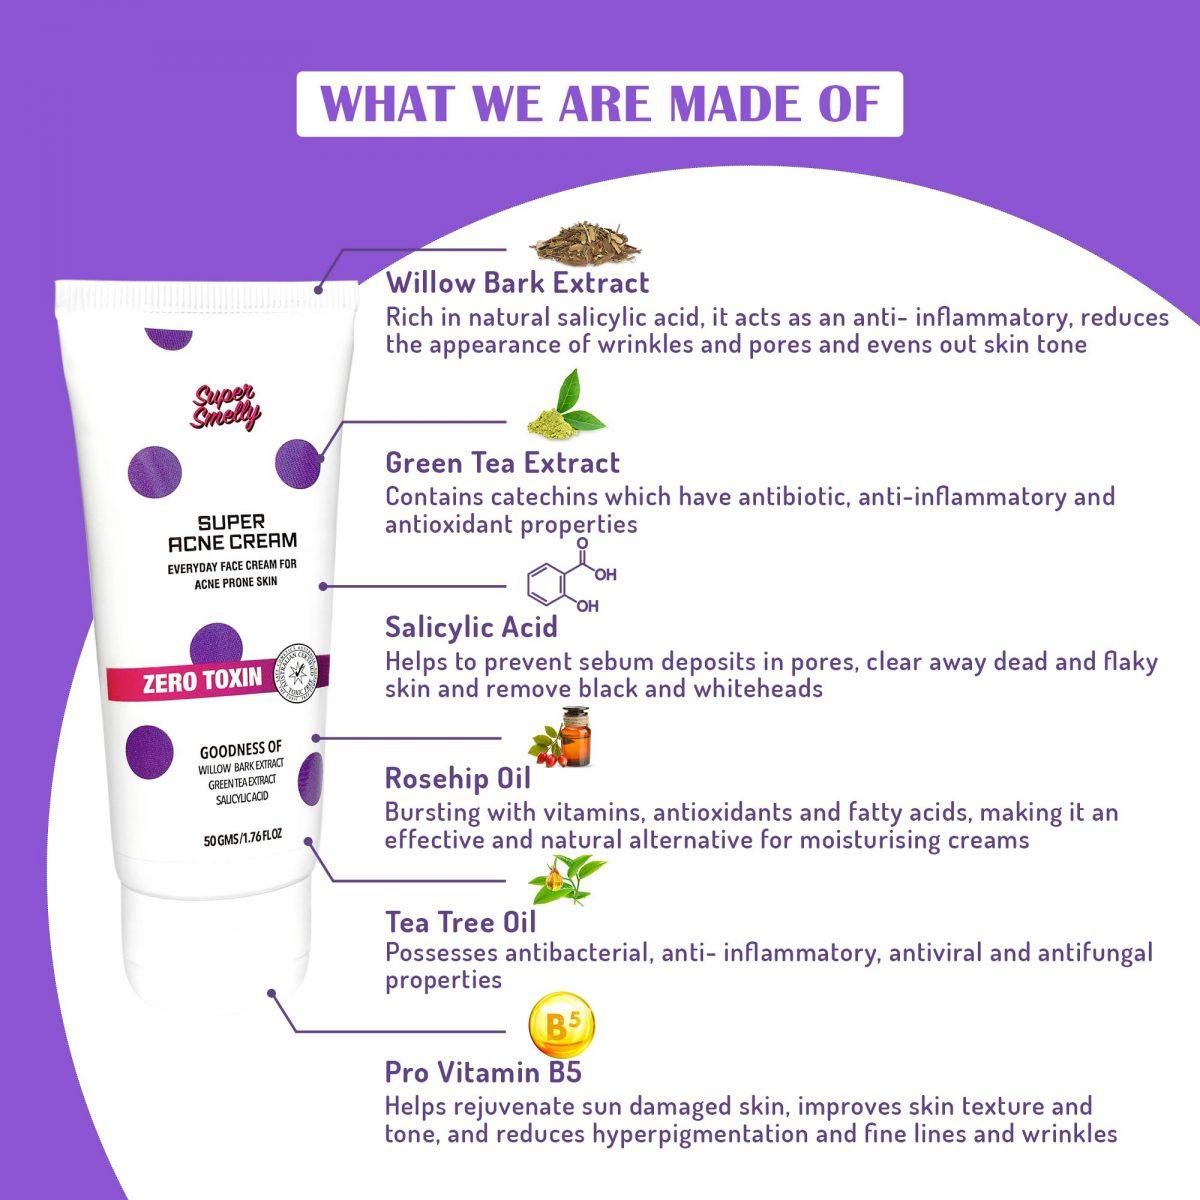 best acne cream in india | Supersmelly acne and pimple cream | acne cream for men | green tea extract face cream | tea tree oil face cream for oily acne prone skin